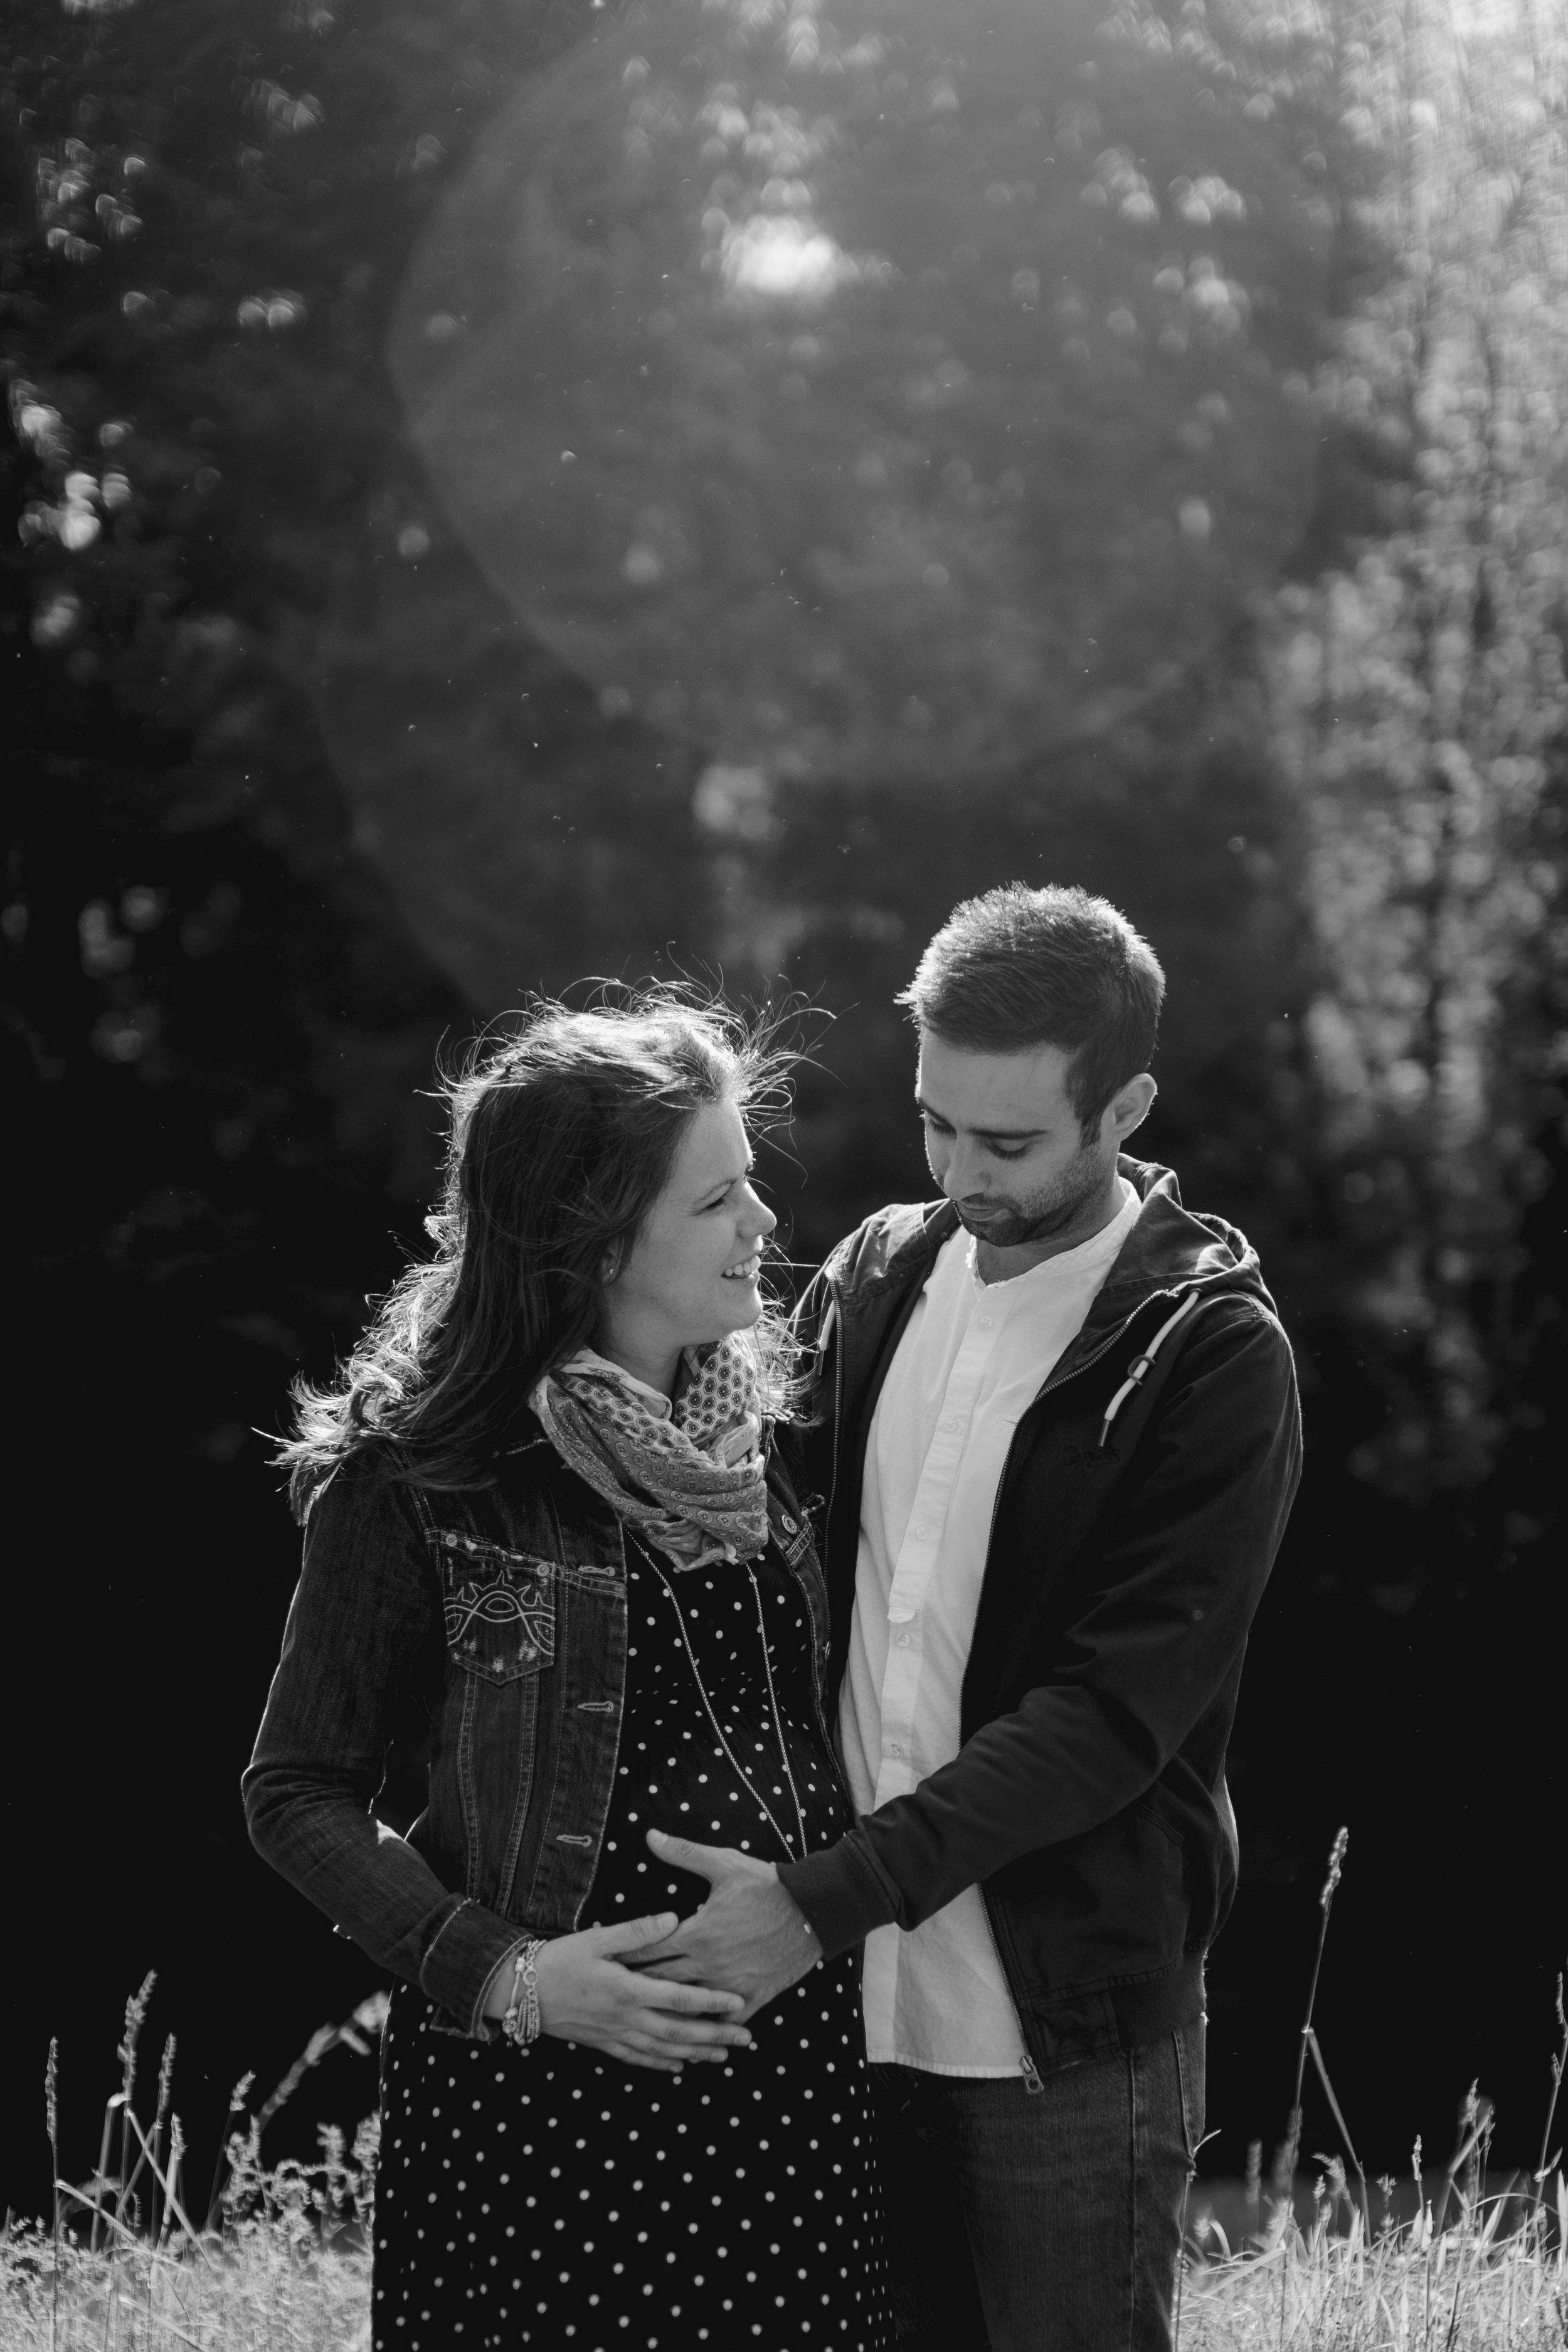 053 - Elena + Davide + Matilde.JPG